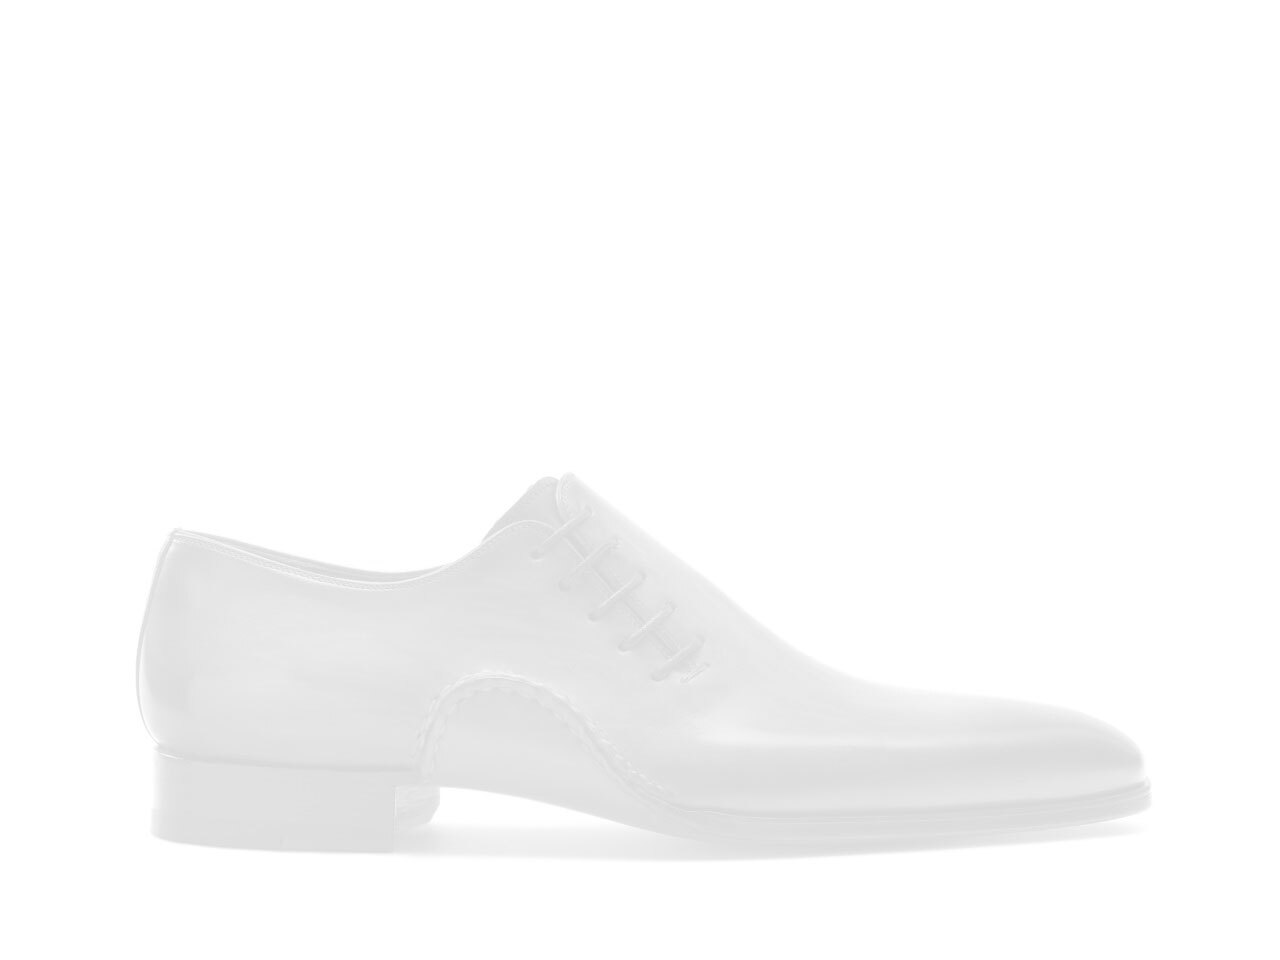 Sole of the Magnanni Volar White Men's Sneakers